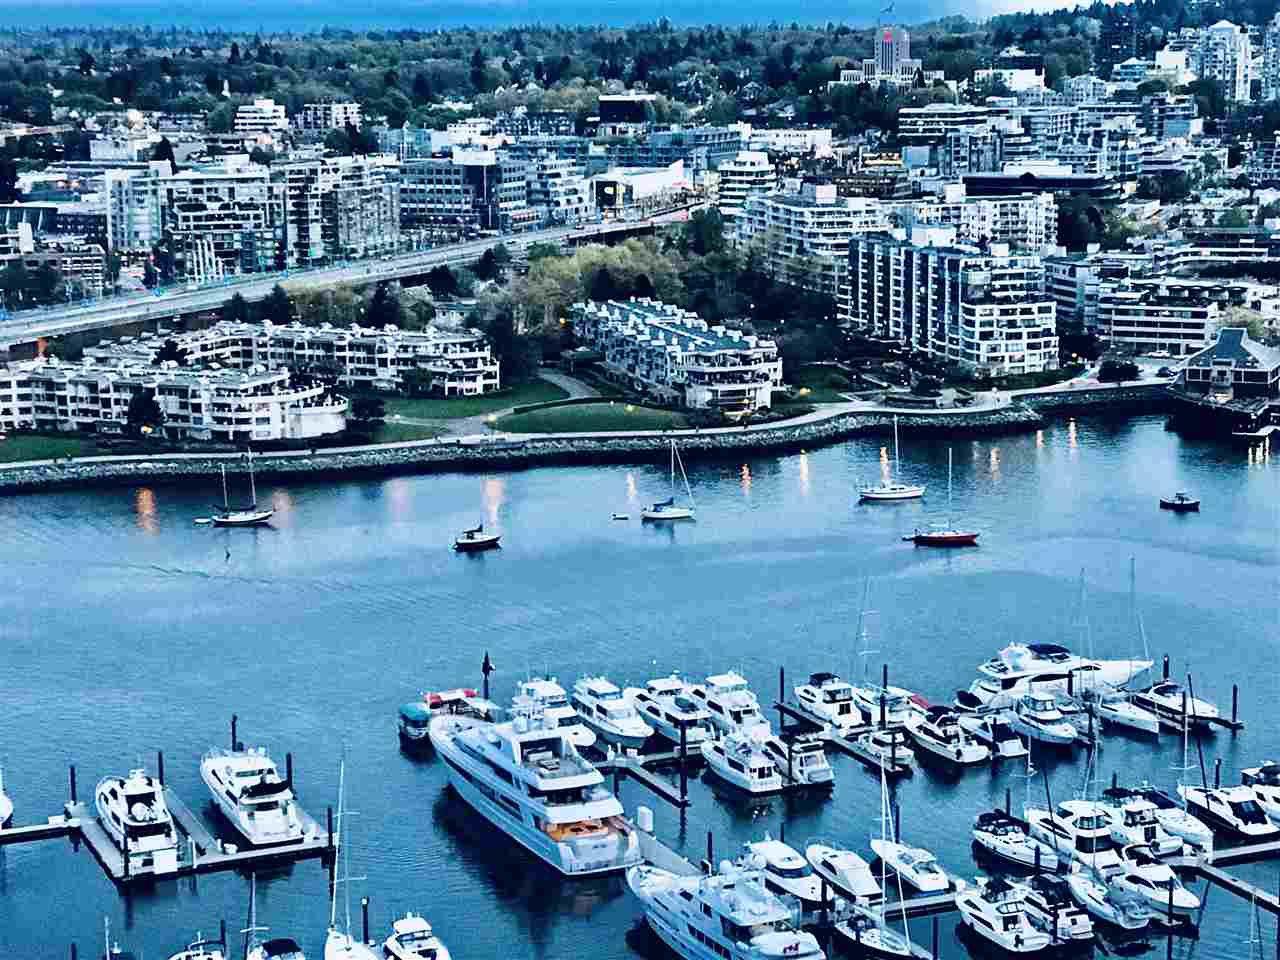 "Main Photo: 3208 198 AQUARIUS Mews in Vancouver: Yaletown Condo for sale in ""AQUARIUS II"" (Vancouver West)  : MLS®# R2422865"